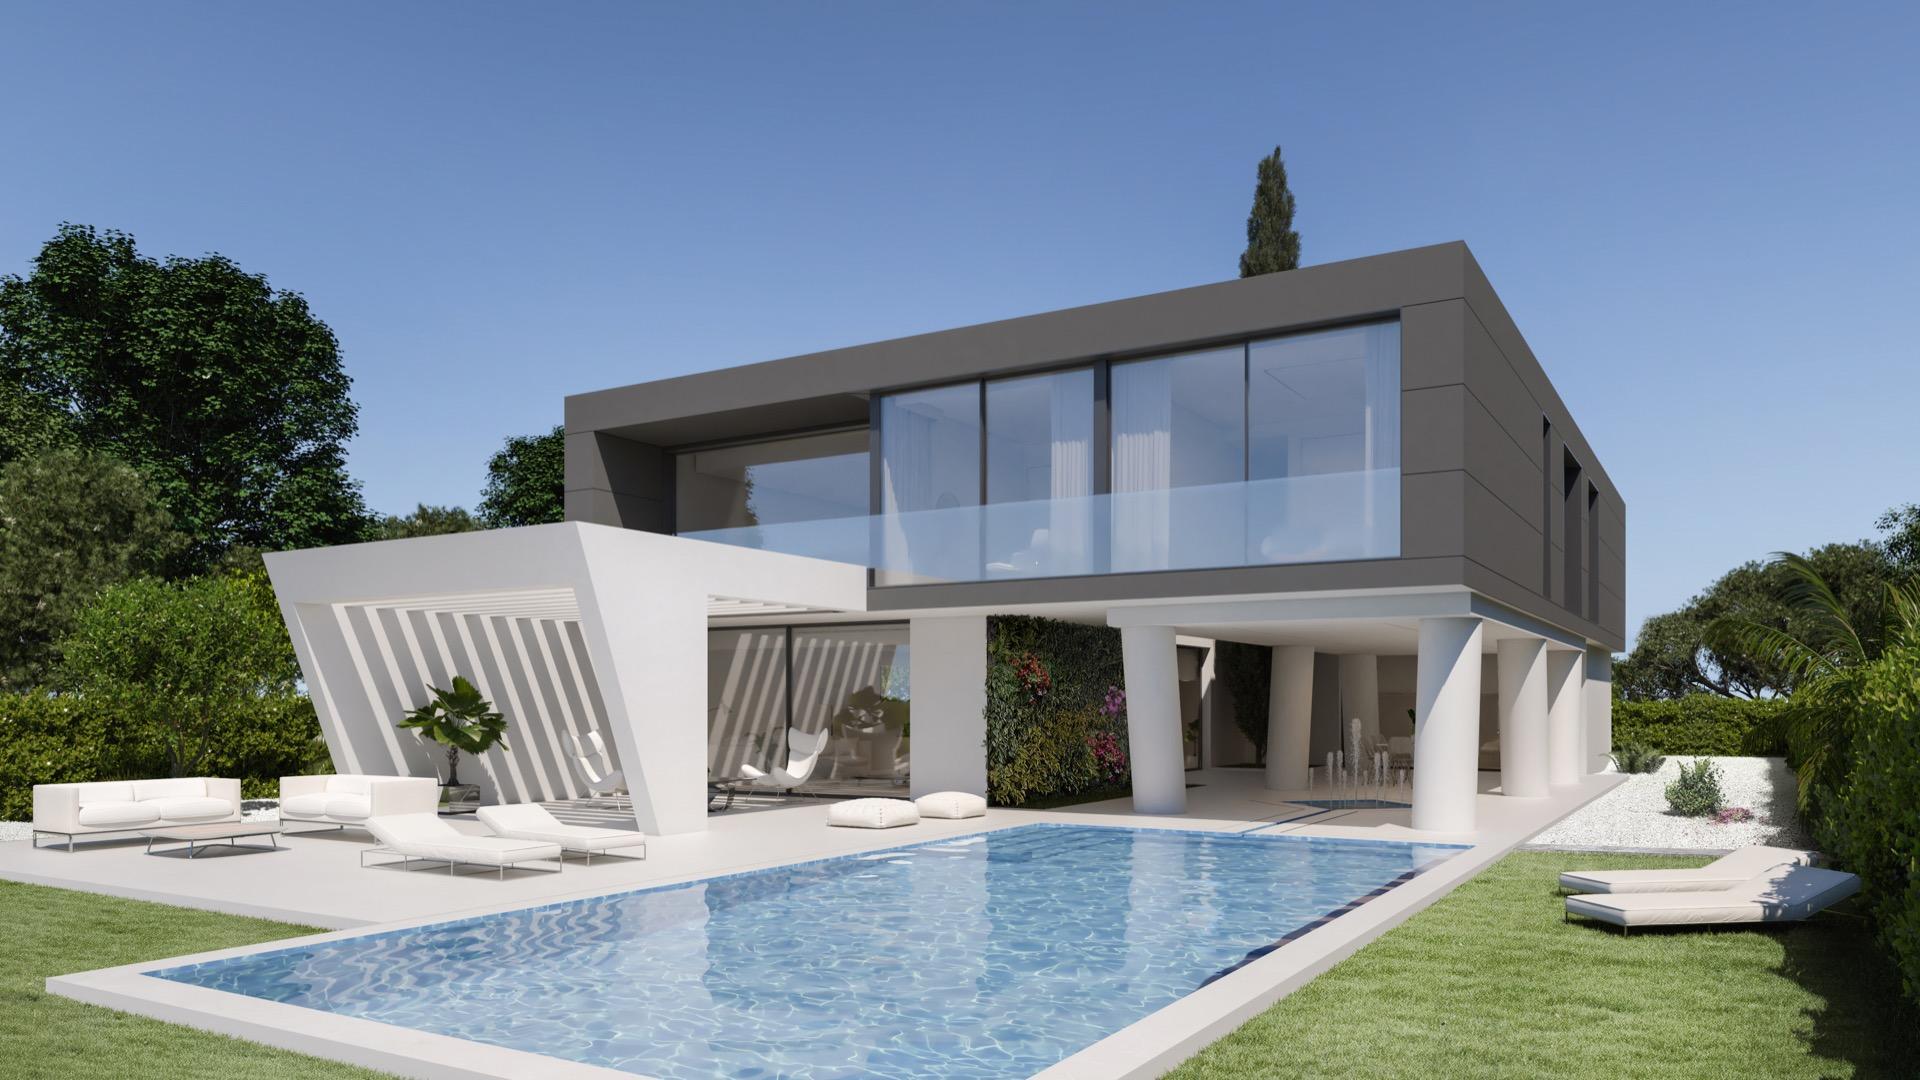 Olimpo villa Altaona golf and country village in Medvilla Spanje